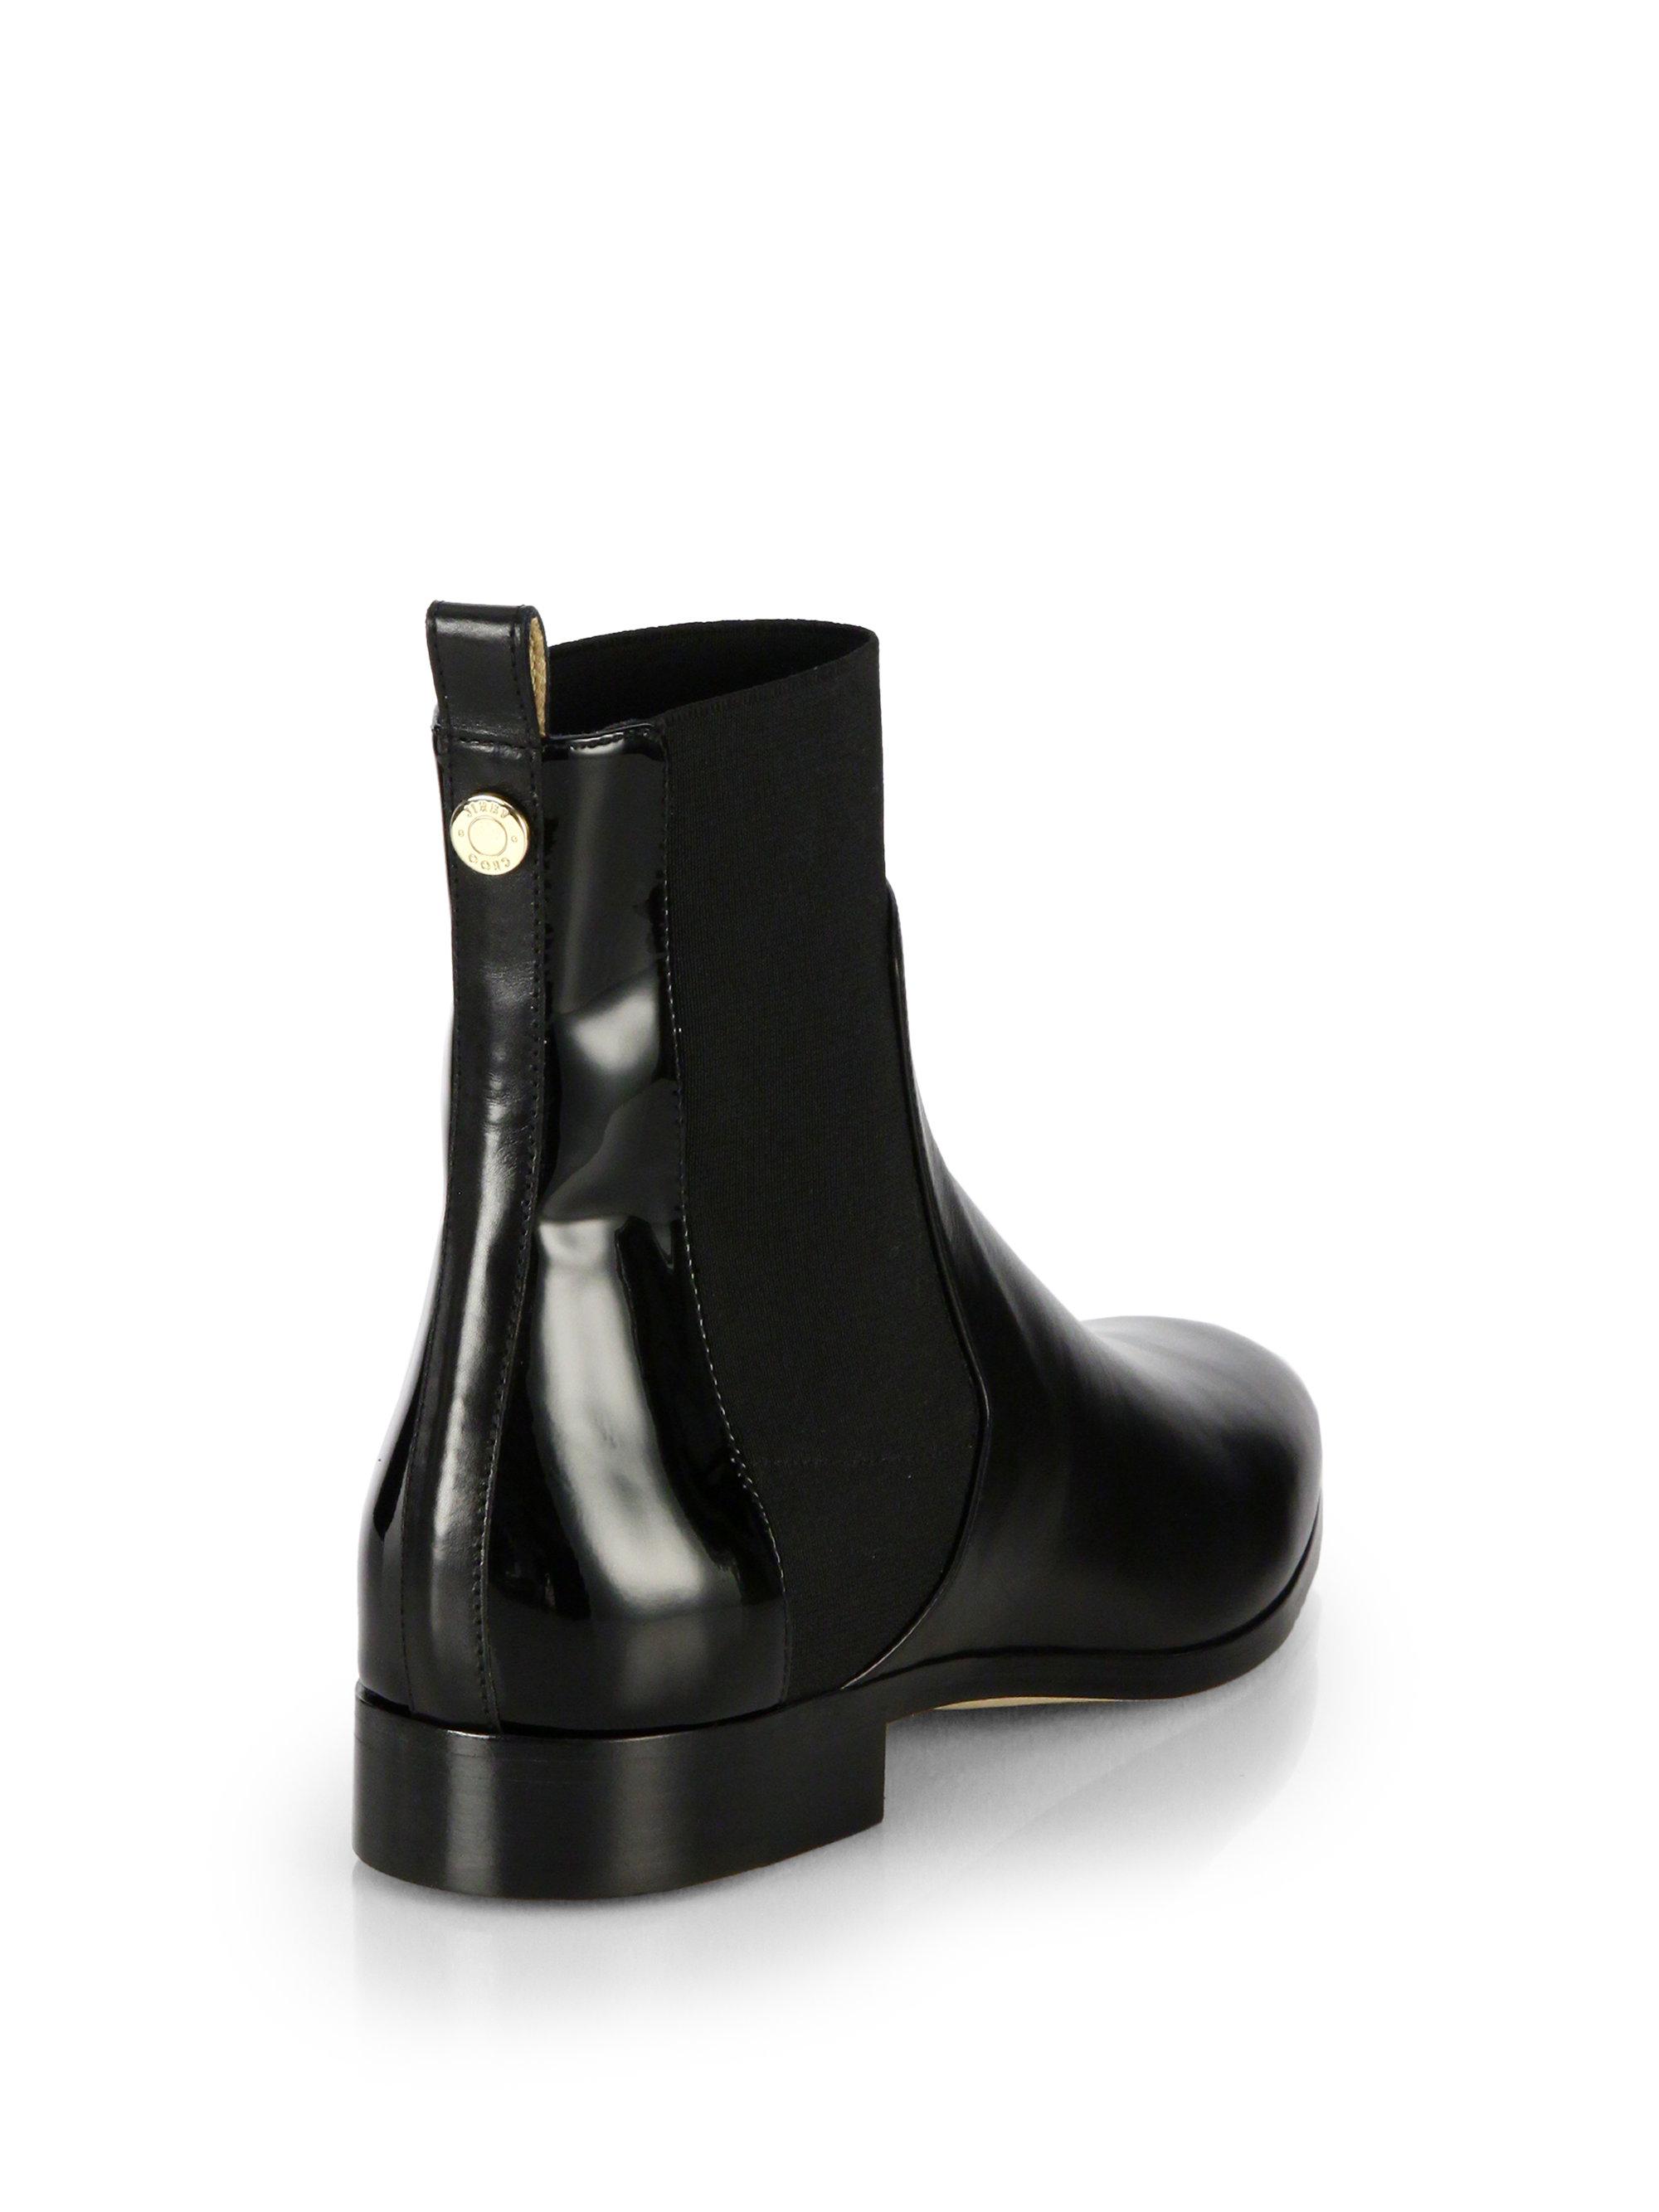 Jimmy choo Suede Merril Flat Chelsea Boots sP1d6